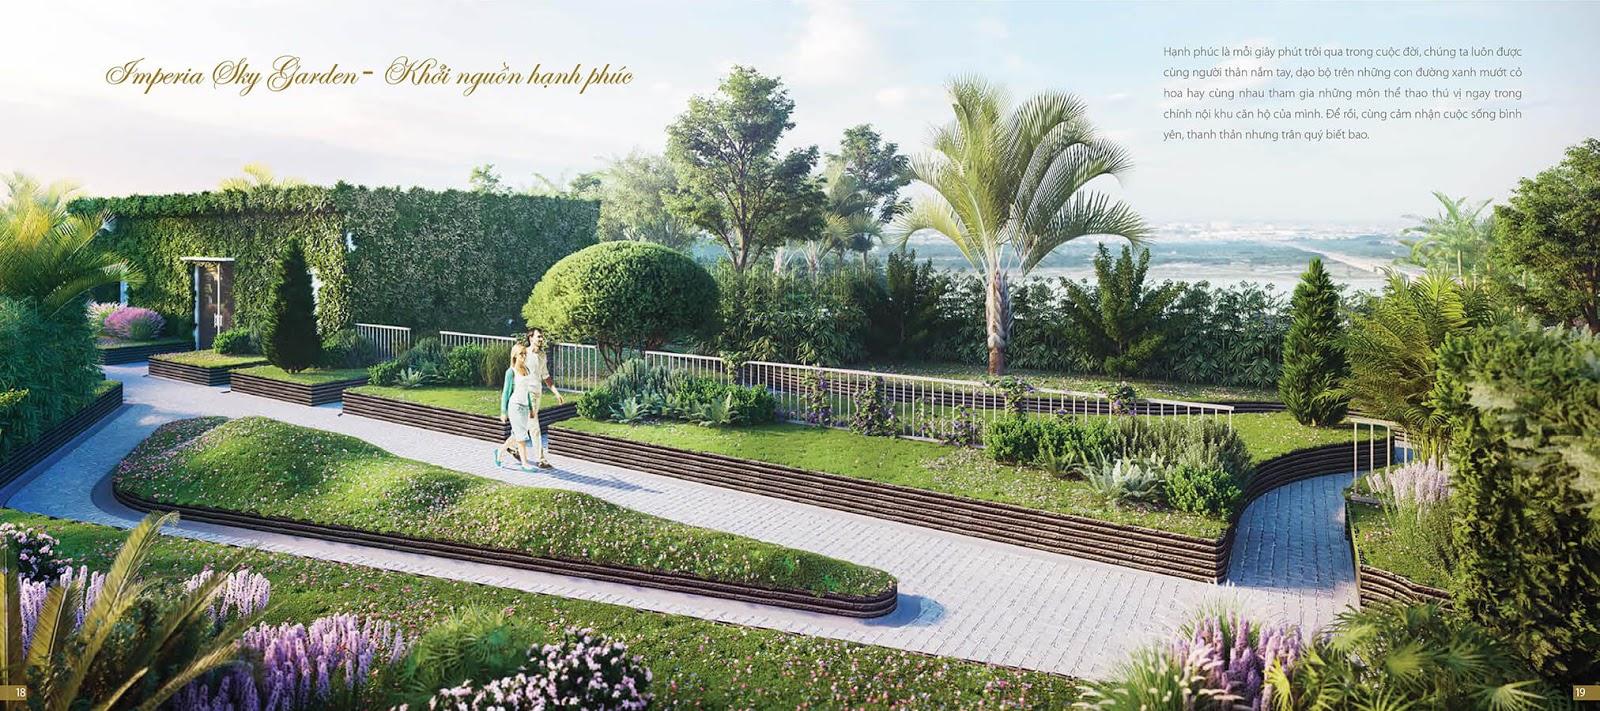 Tiện ích sân vườn chung cư Imperia Sky Garden